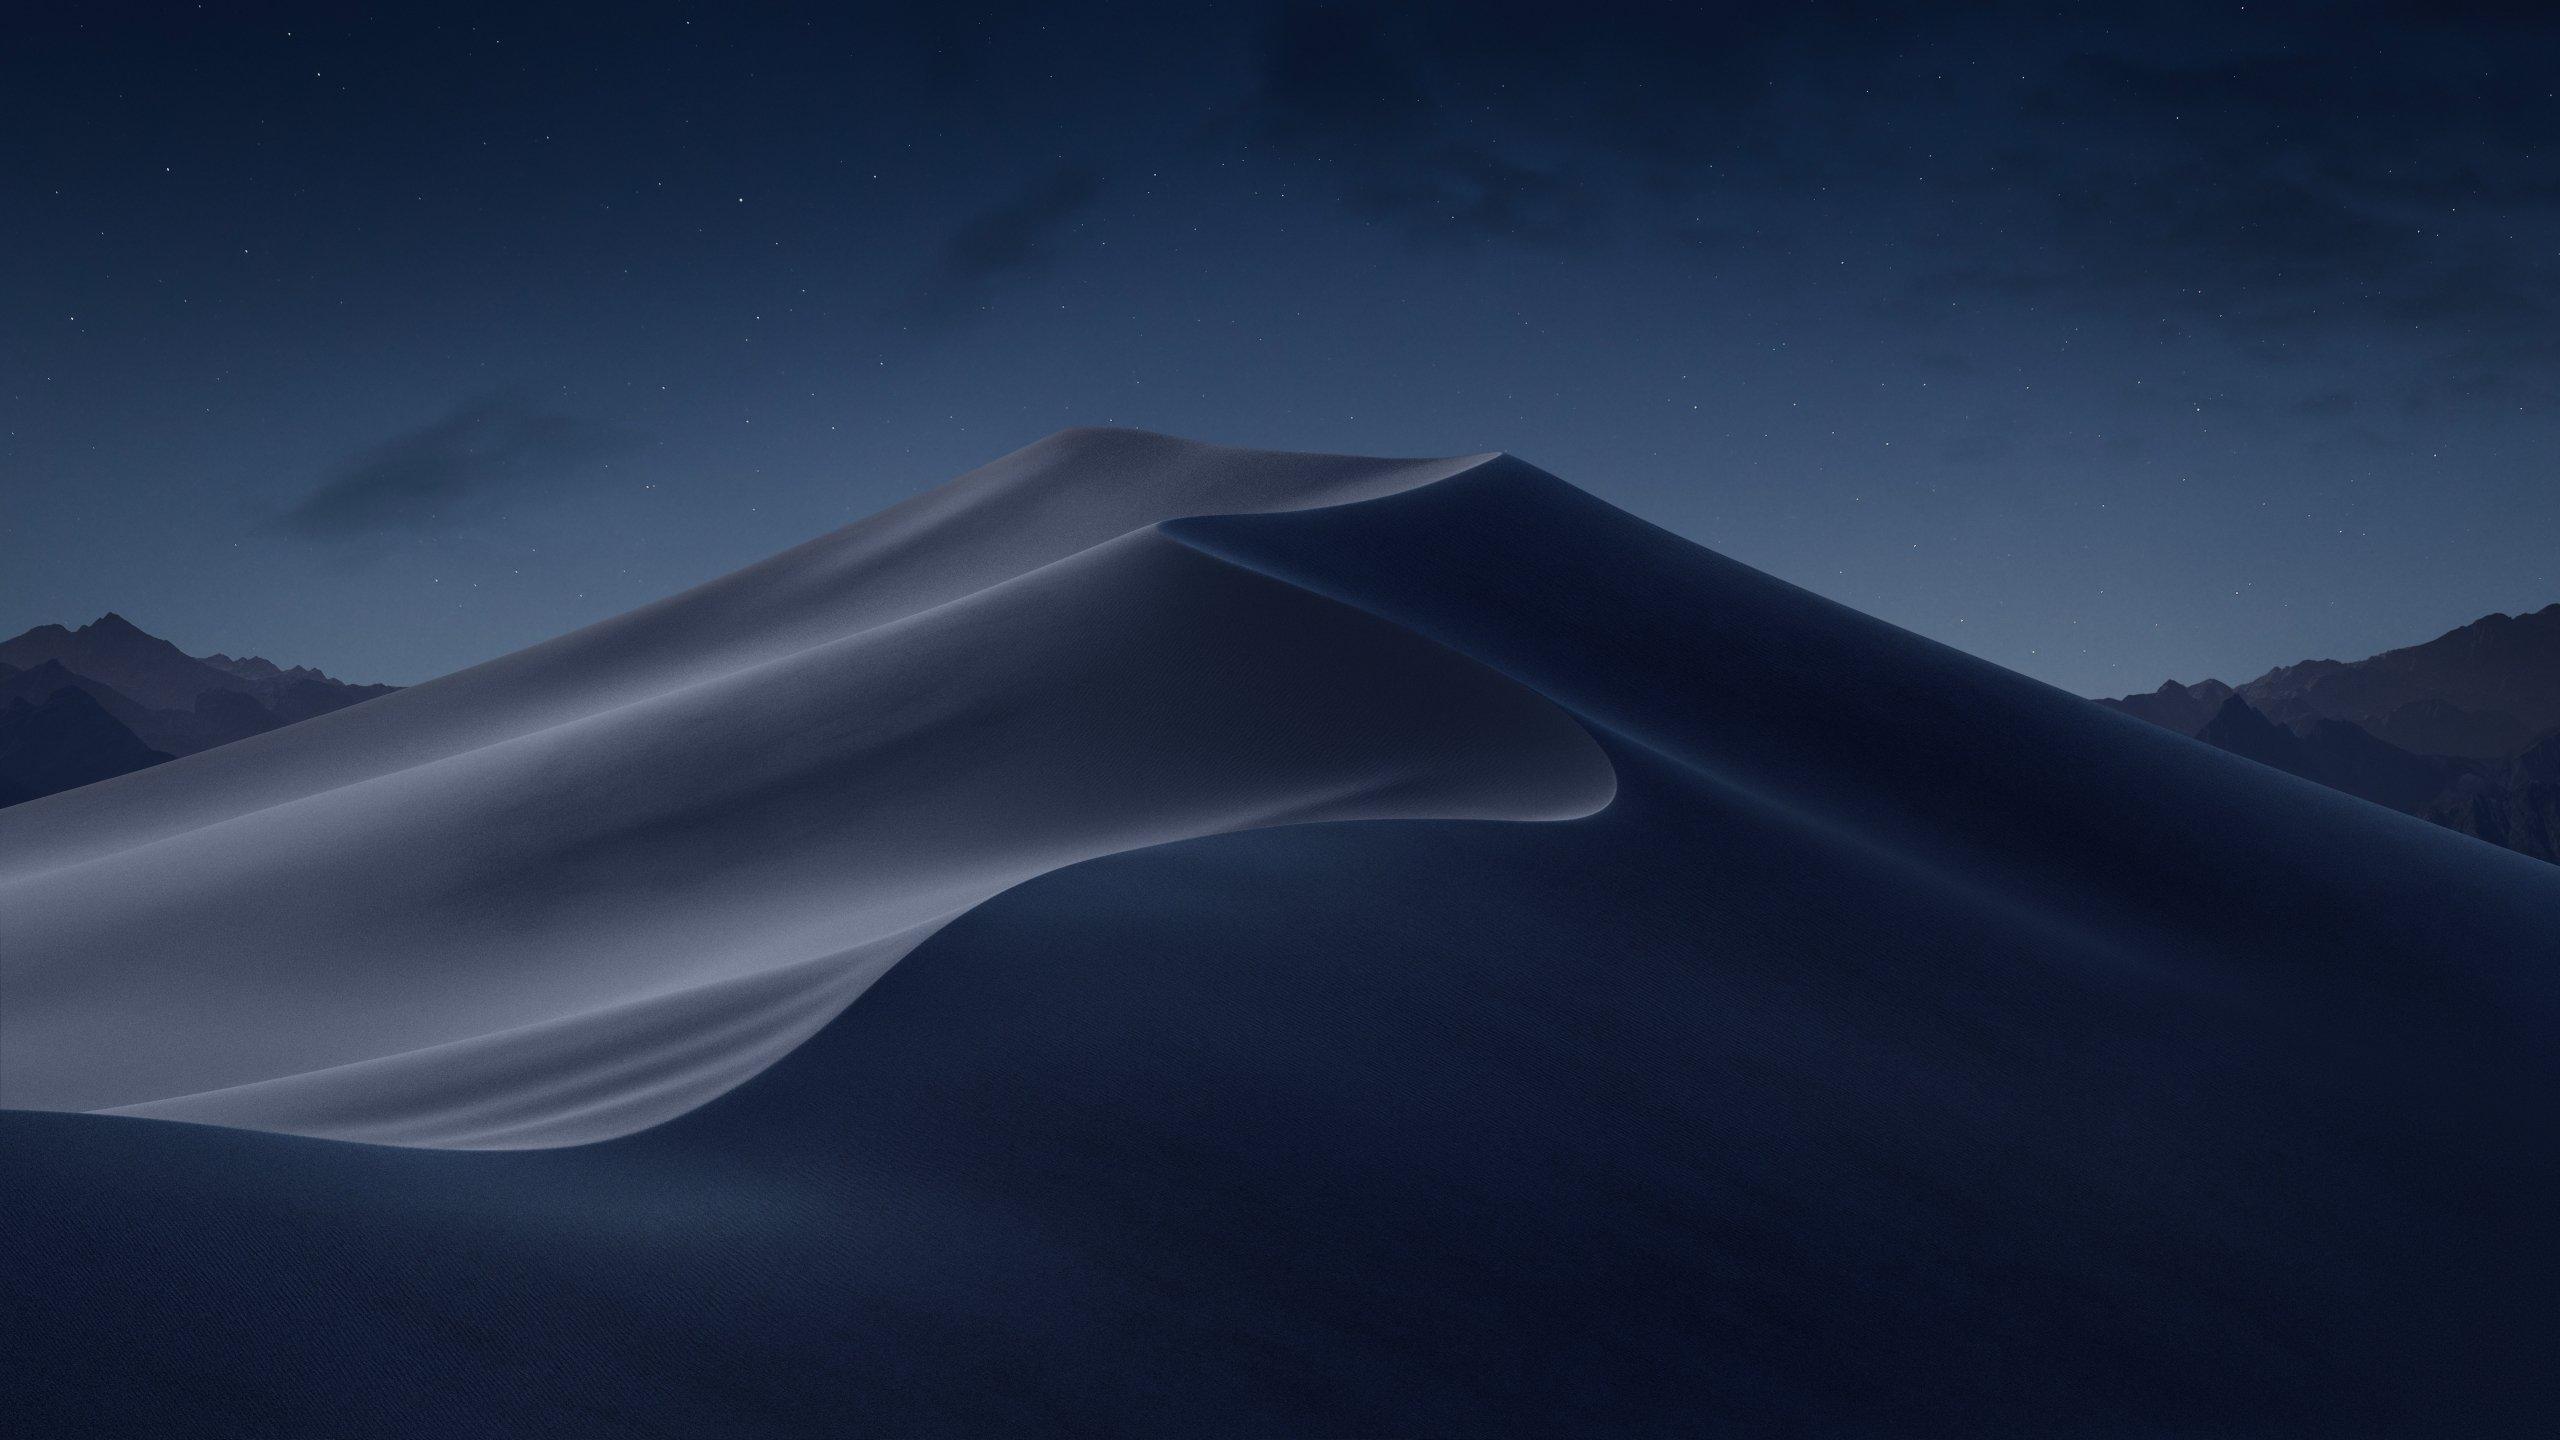 Macos Mojave Night Mode Wallpaper 5k Ultra Hd Id3298